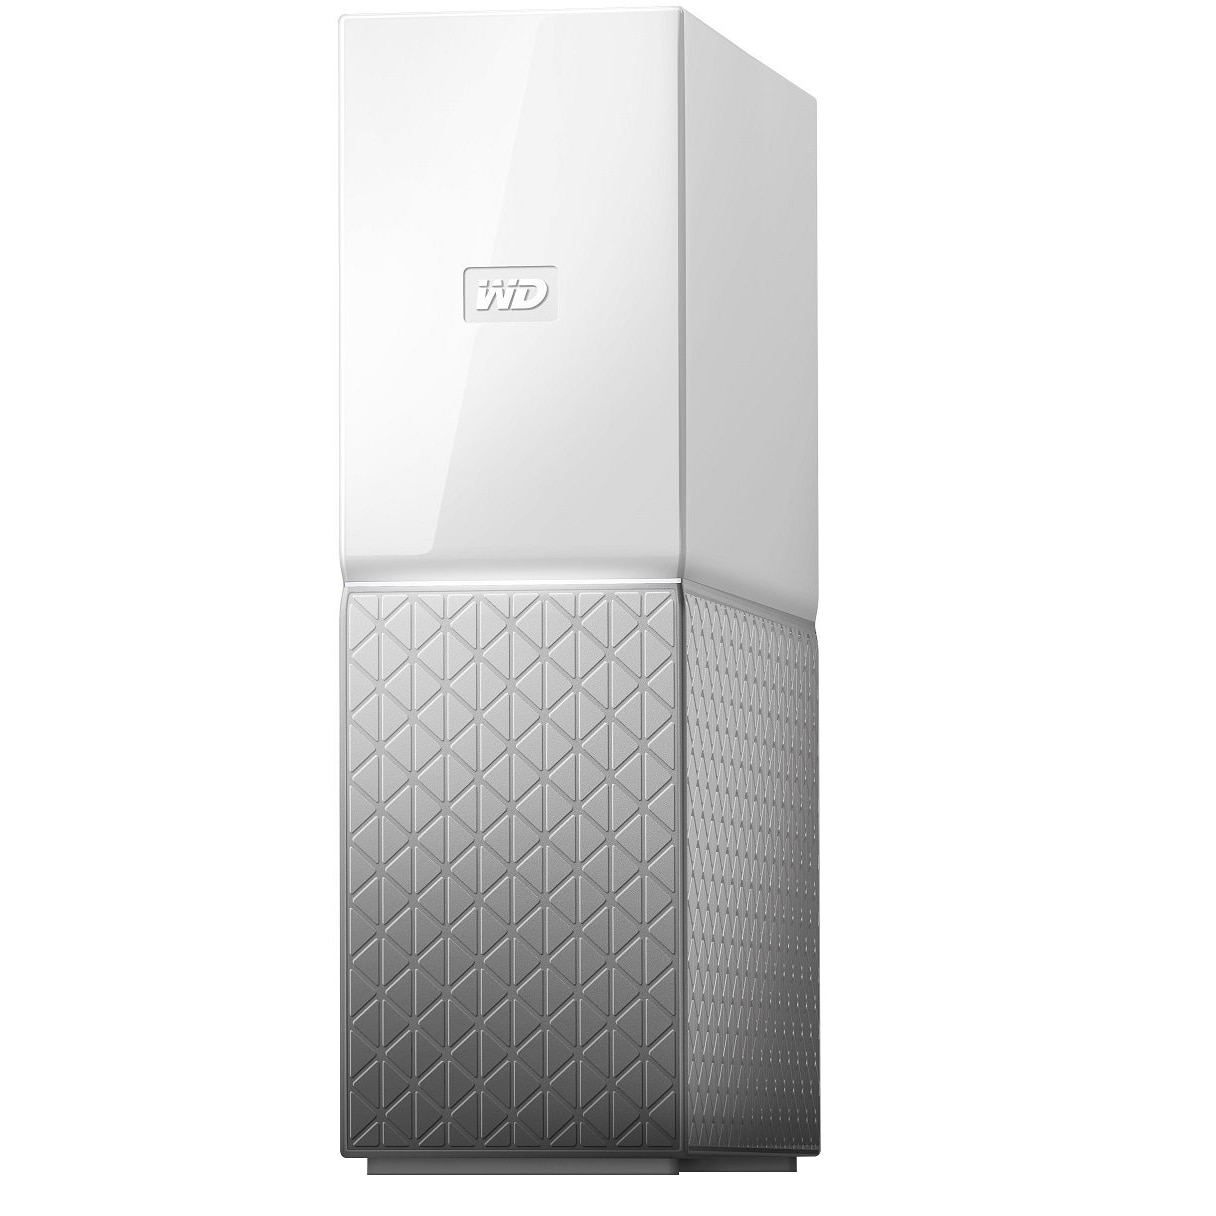 Fotografie Personal Cloud Storage WD My Home, 3TB, Gigabit Ethernet, USB, Alb